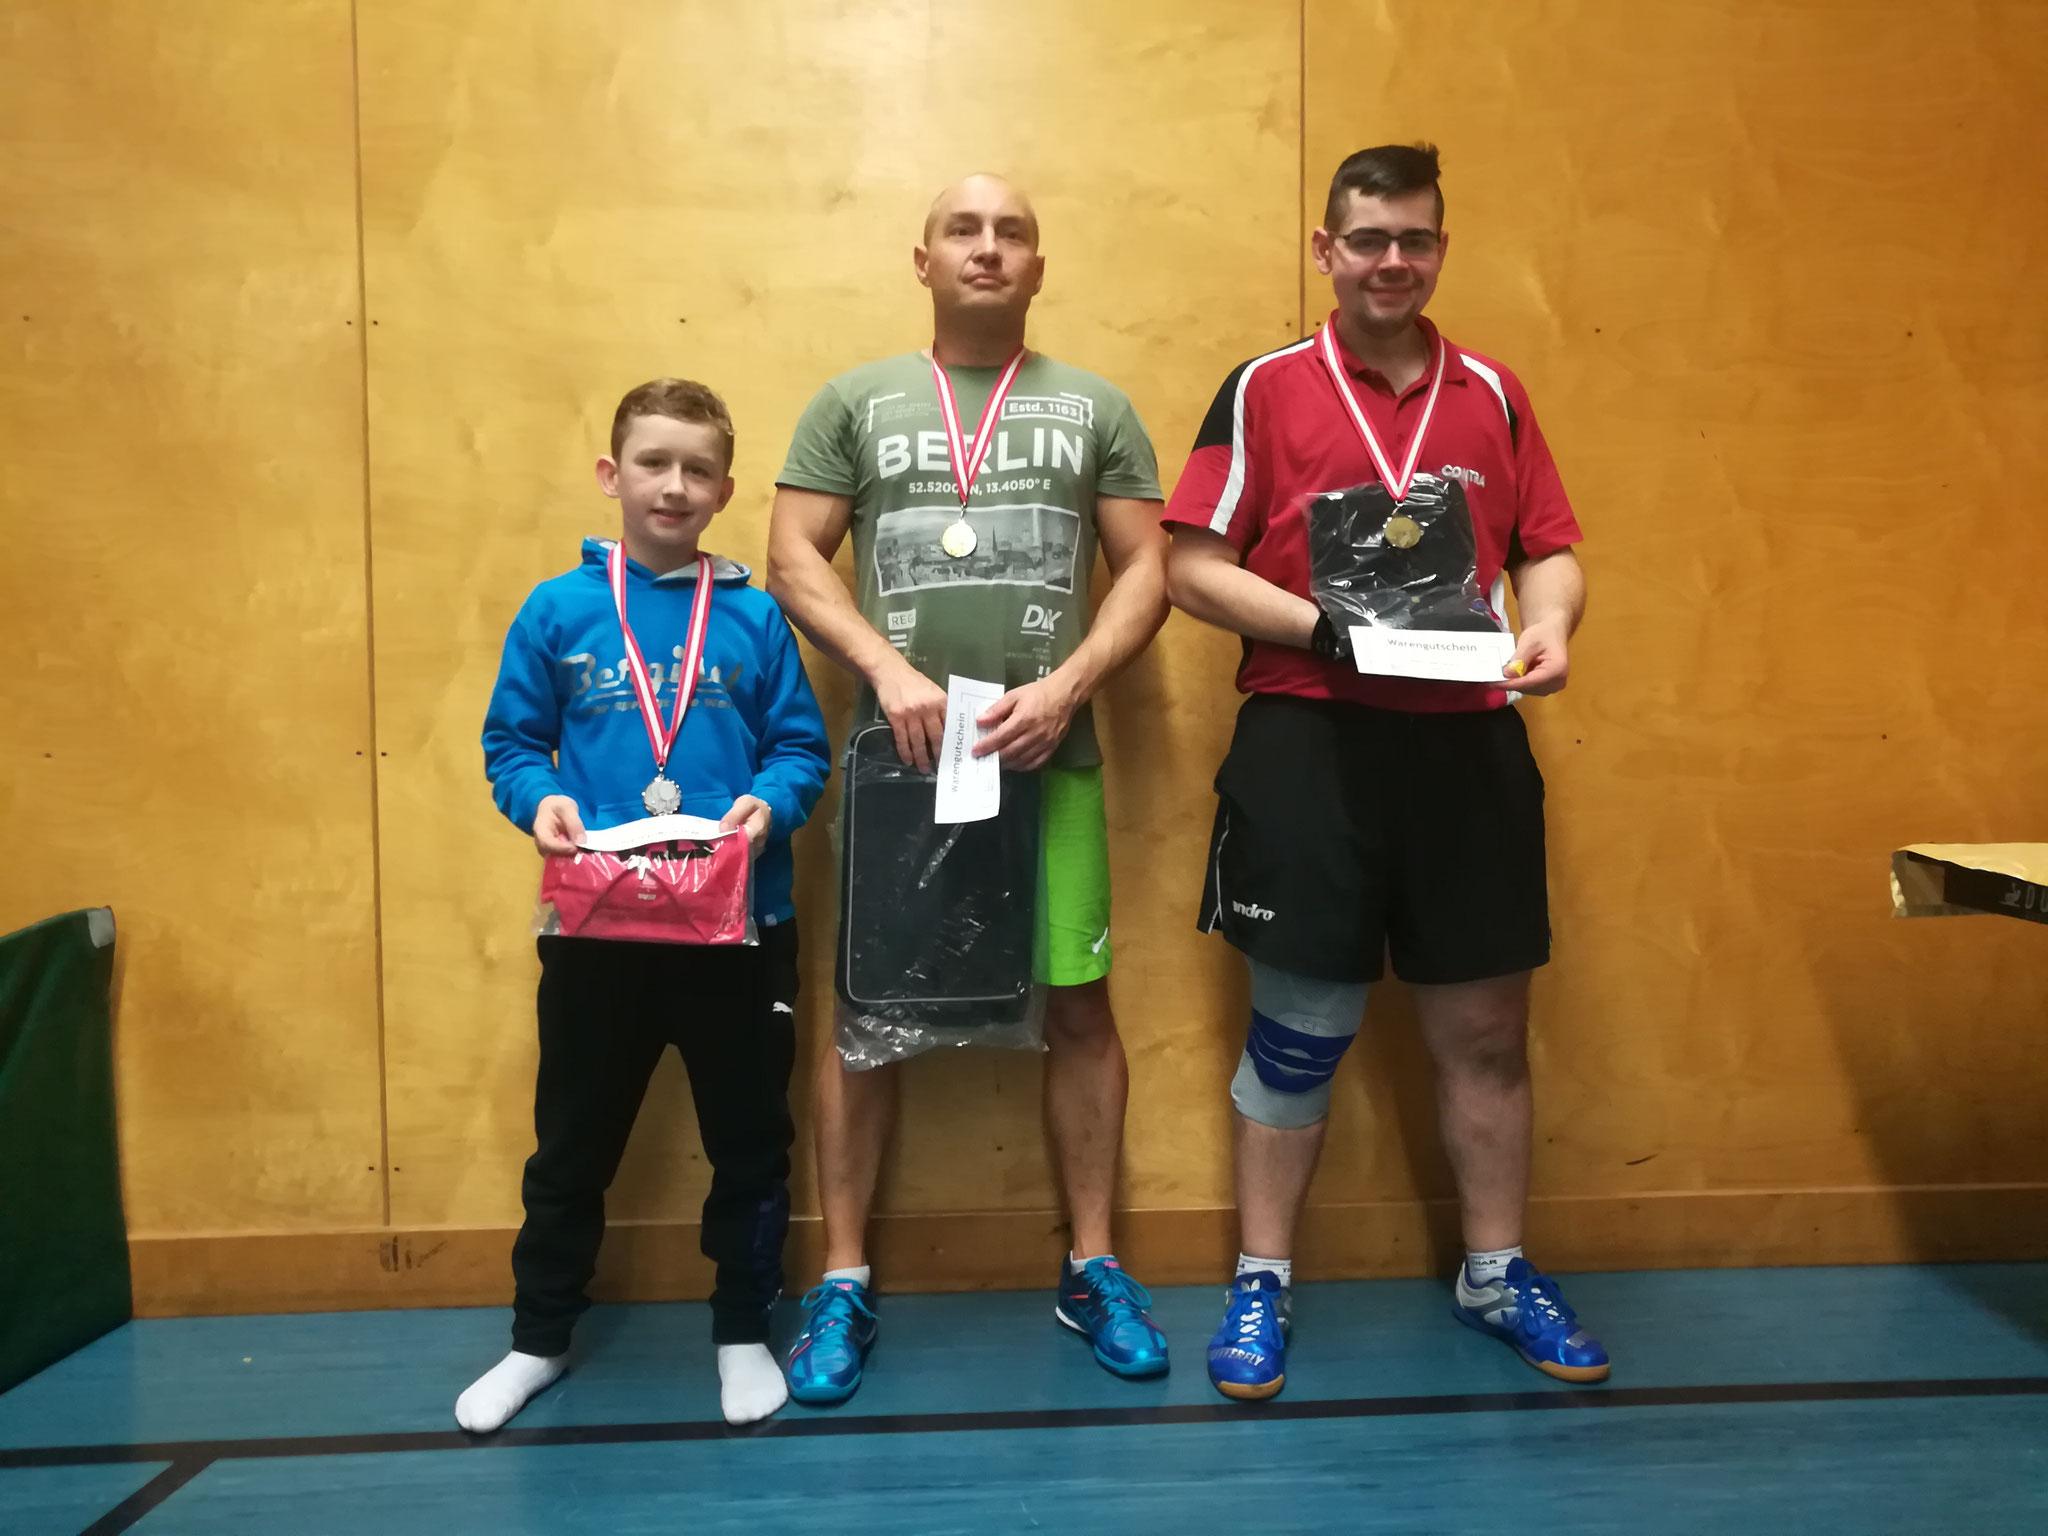 Siegerfoto Bewerb B: v.l.n.r. Julian Rzihauschek (SVS) (Platz 2), Marcin Gibala (WPAE) (Sieger), Mathias Haidvogl (SPAR) (Platz 3)